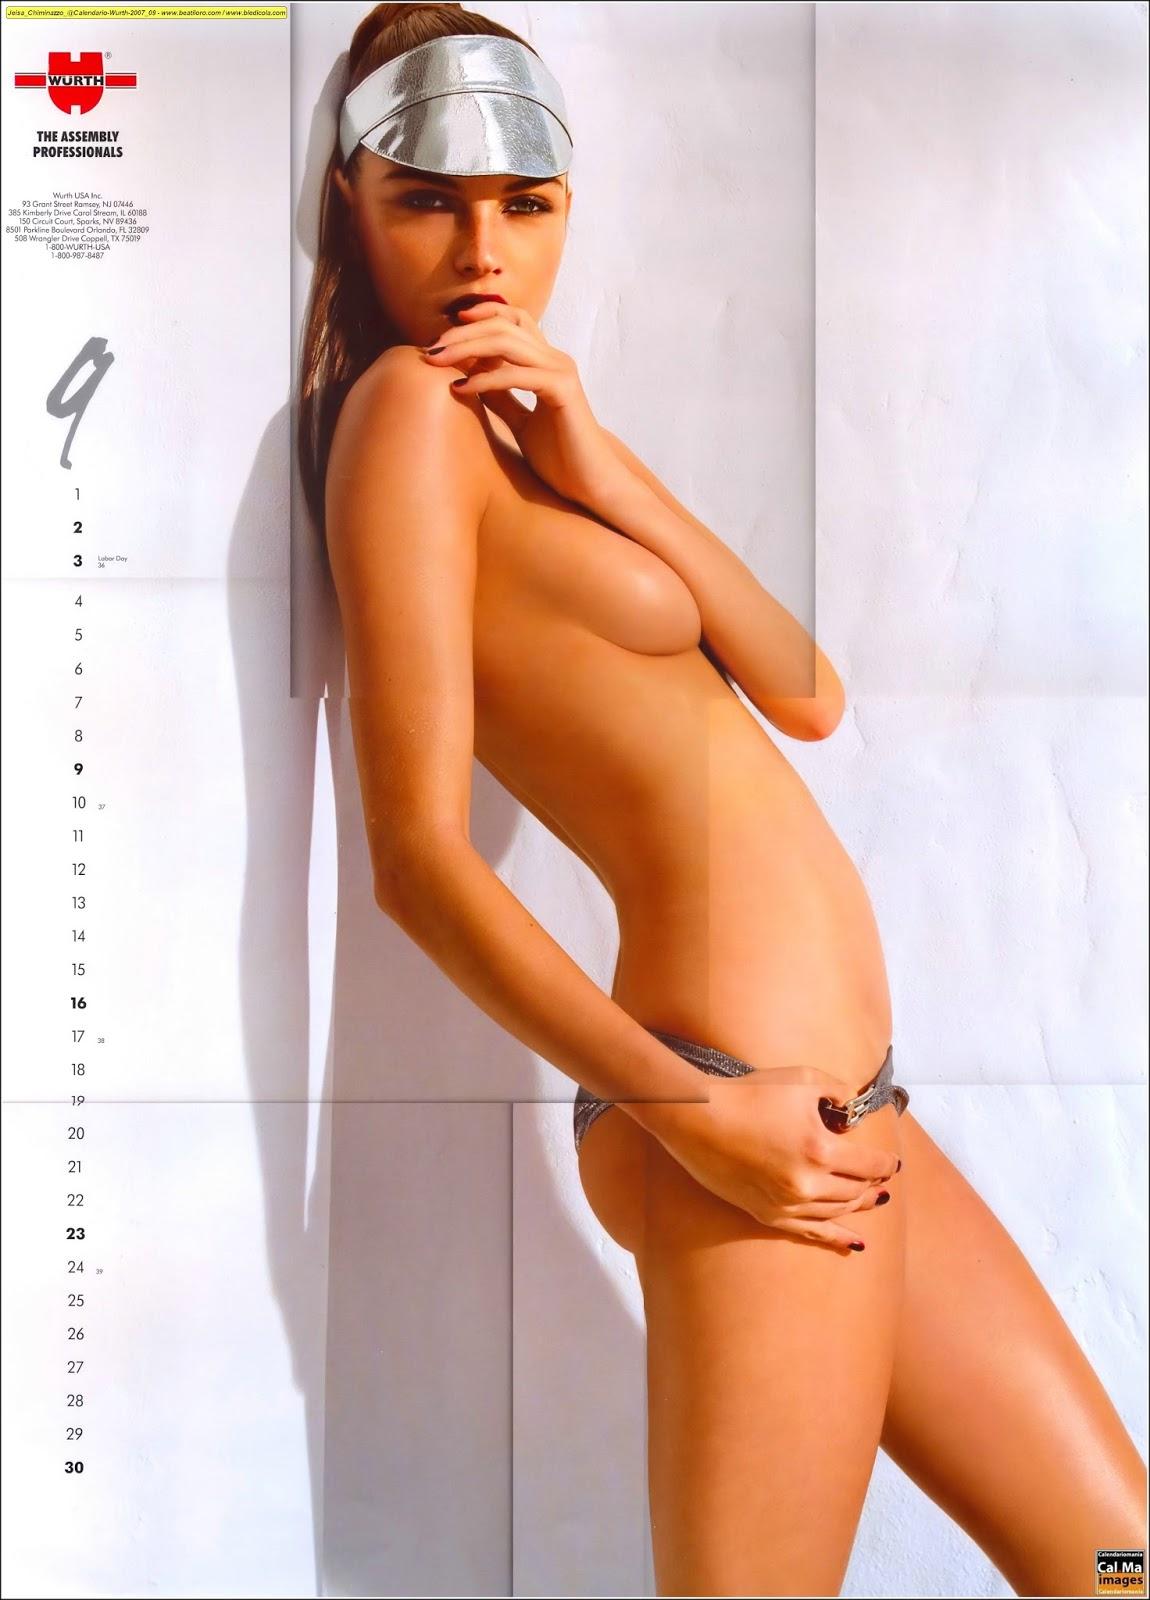 jeisa chiminazzo nude pics